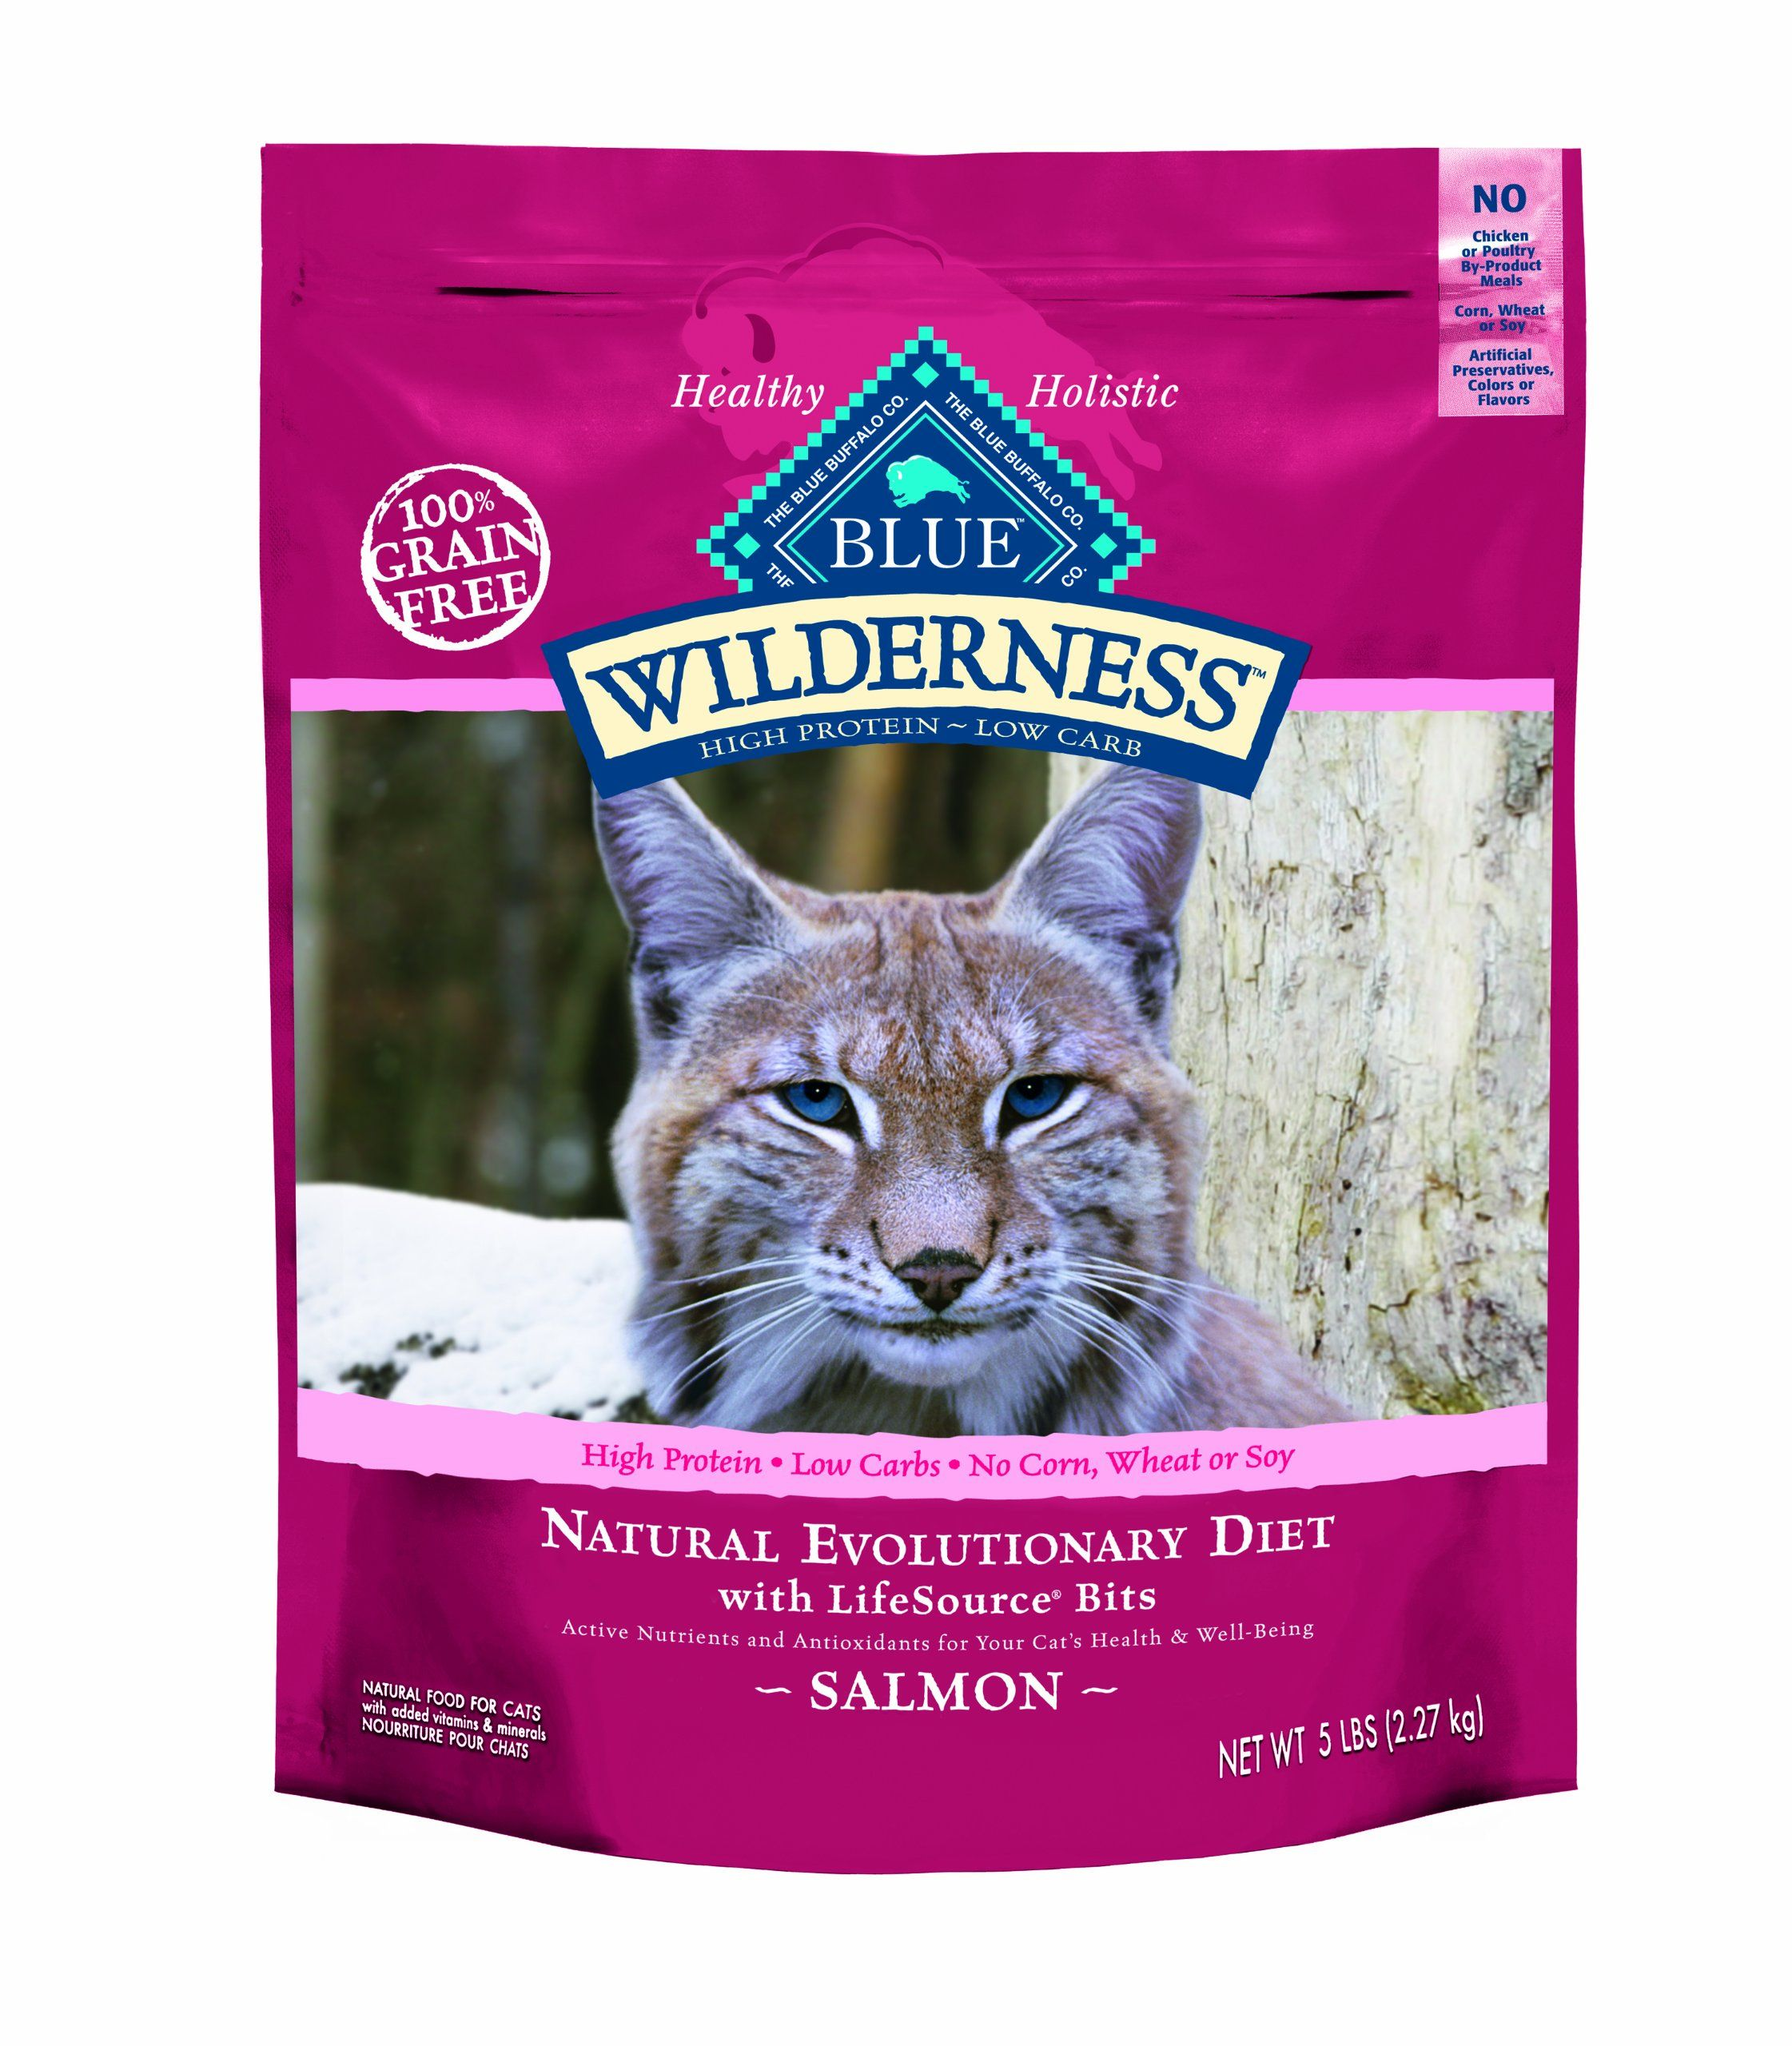 Blue Buffalo Wilderness Grain Free Dry Cat Food Salmon Recipe 11 Pound Bag Cat Food Dry Cat Food Free Cat Food